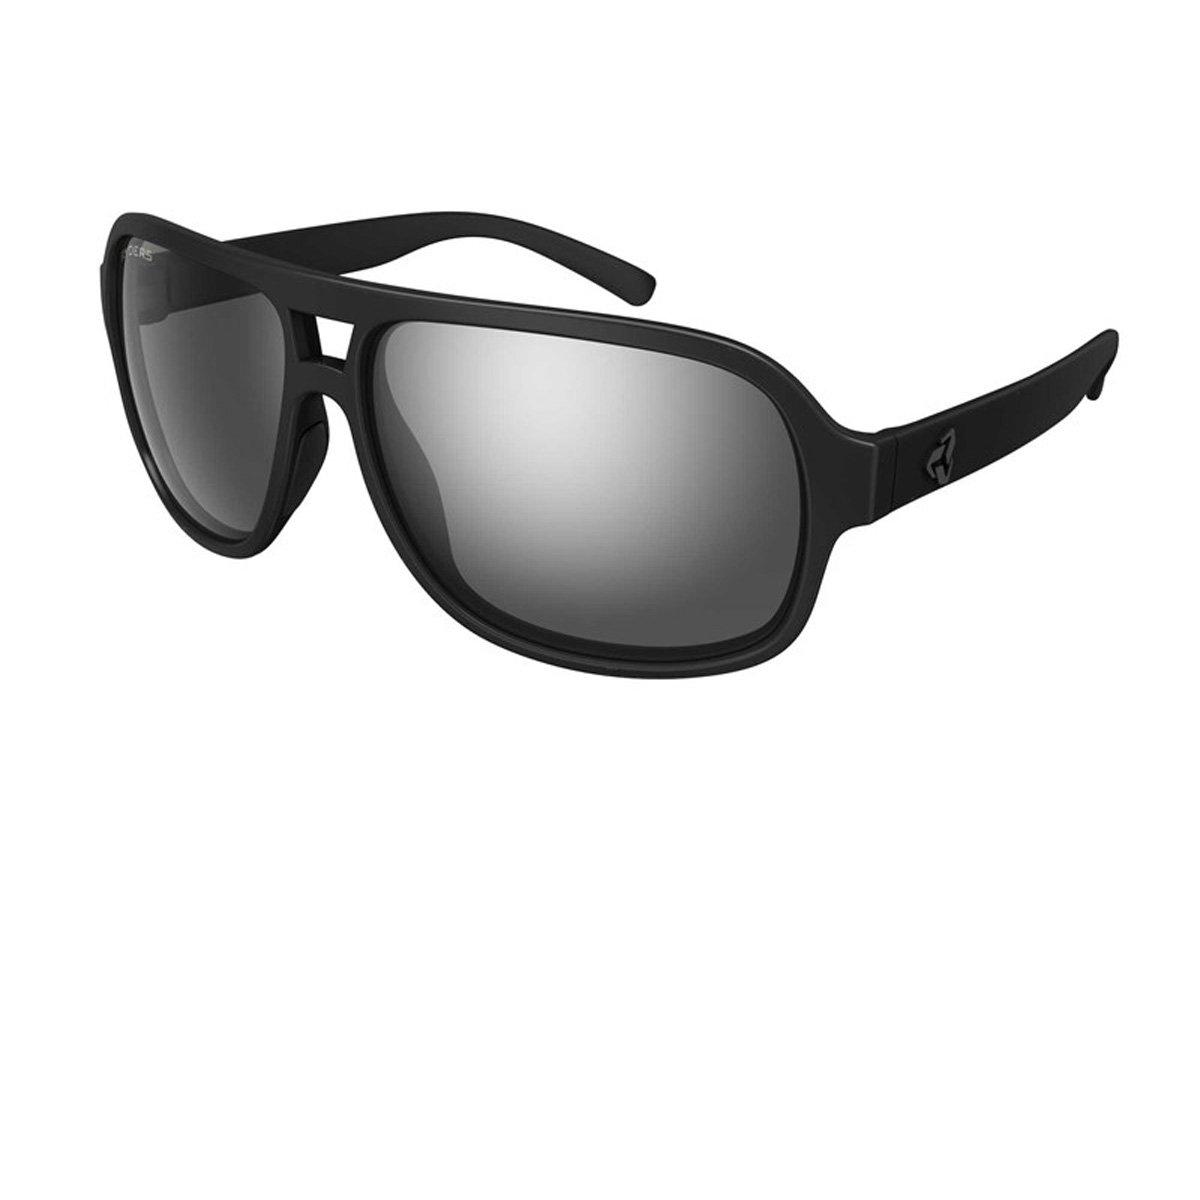 Ryders Eyewear Pint曇り止めサングラス  BLACK MATTE / GREY LENS SILVER FM ANTI-FOG B06WXX6T3J